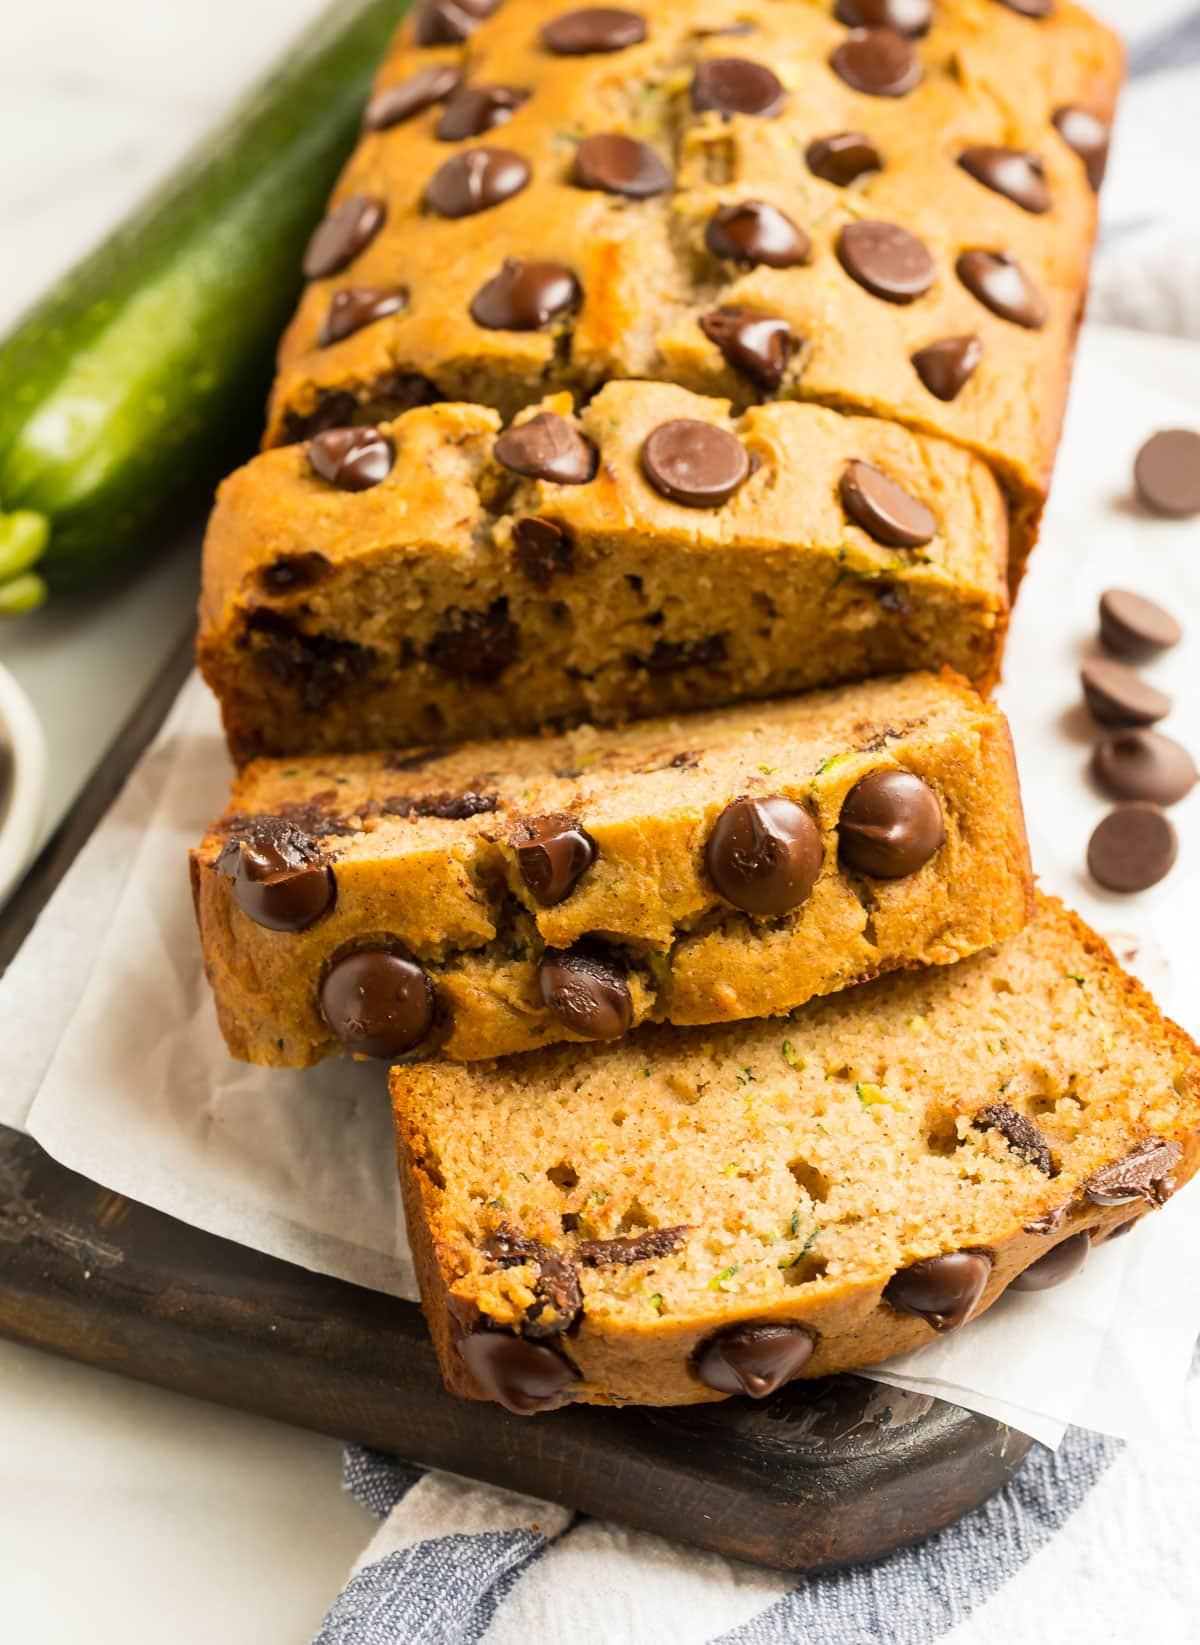 Healthy gluten free zucchini bread